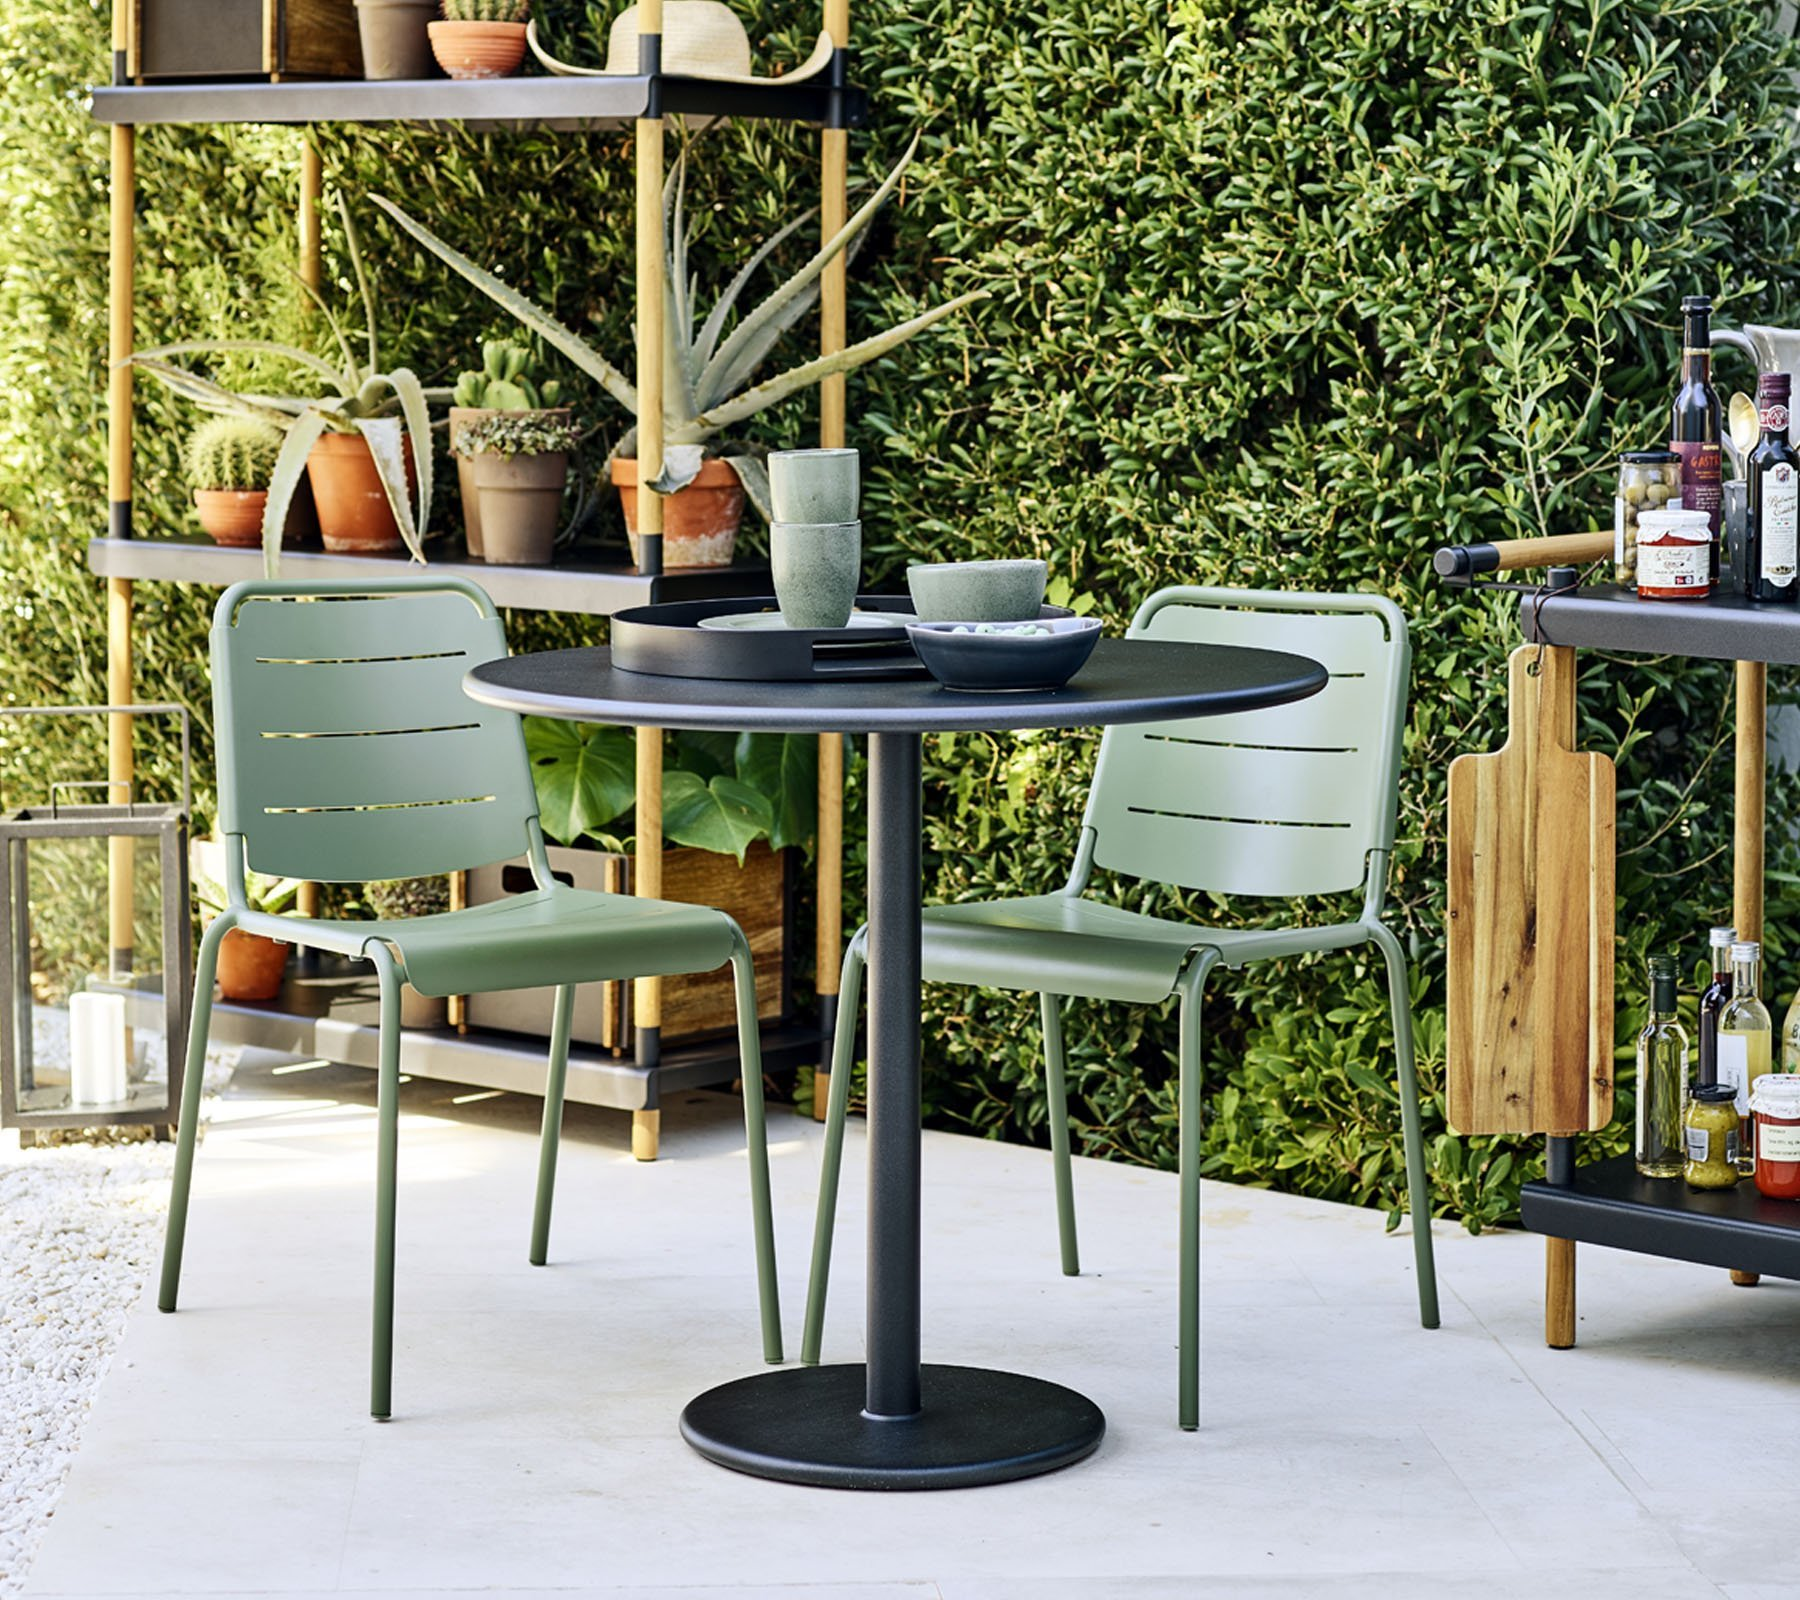 Copenhagen City Chair from Cane-line, designed by Strand+Hvass